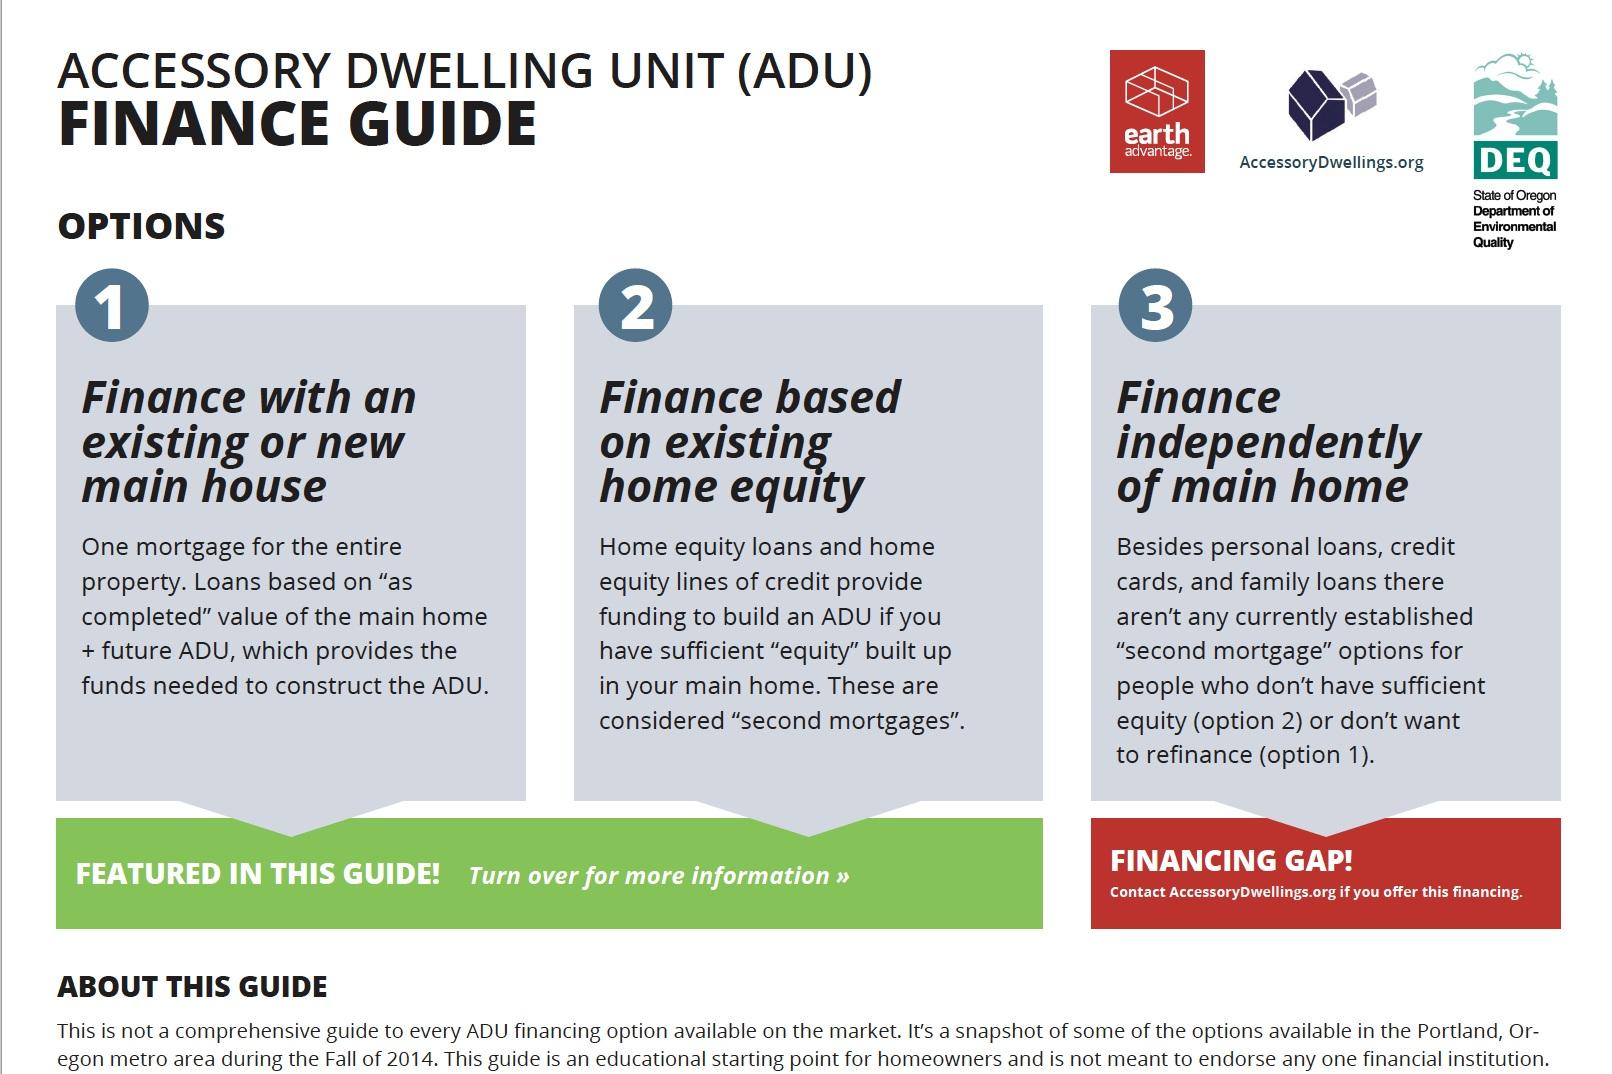 adu_finance_guide.jpg